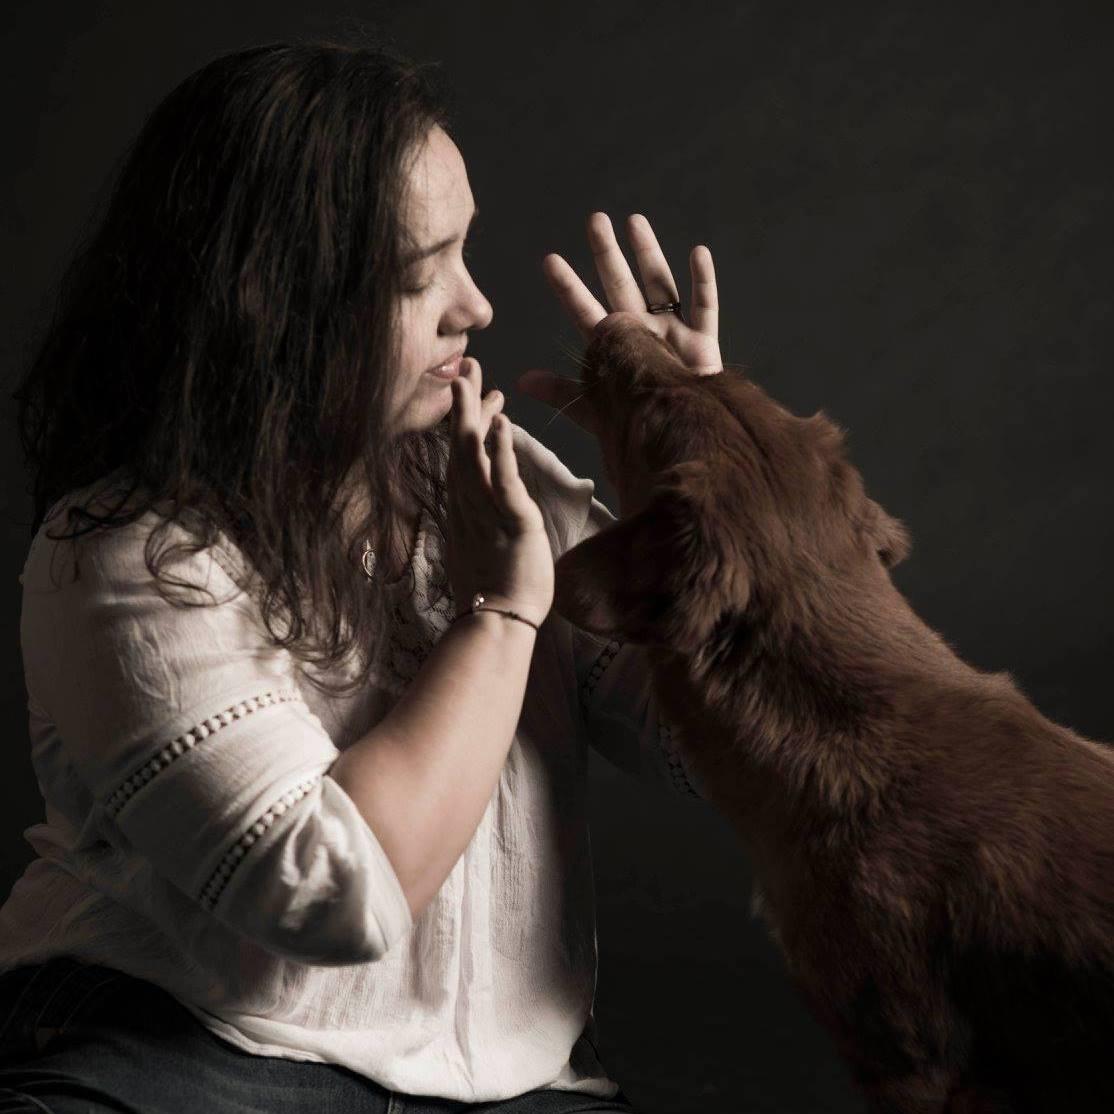 muzo-pauline-vidal-boubal-jury-instructeur-fitness-canin.jpg